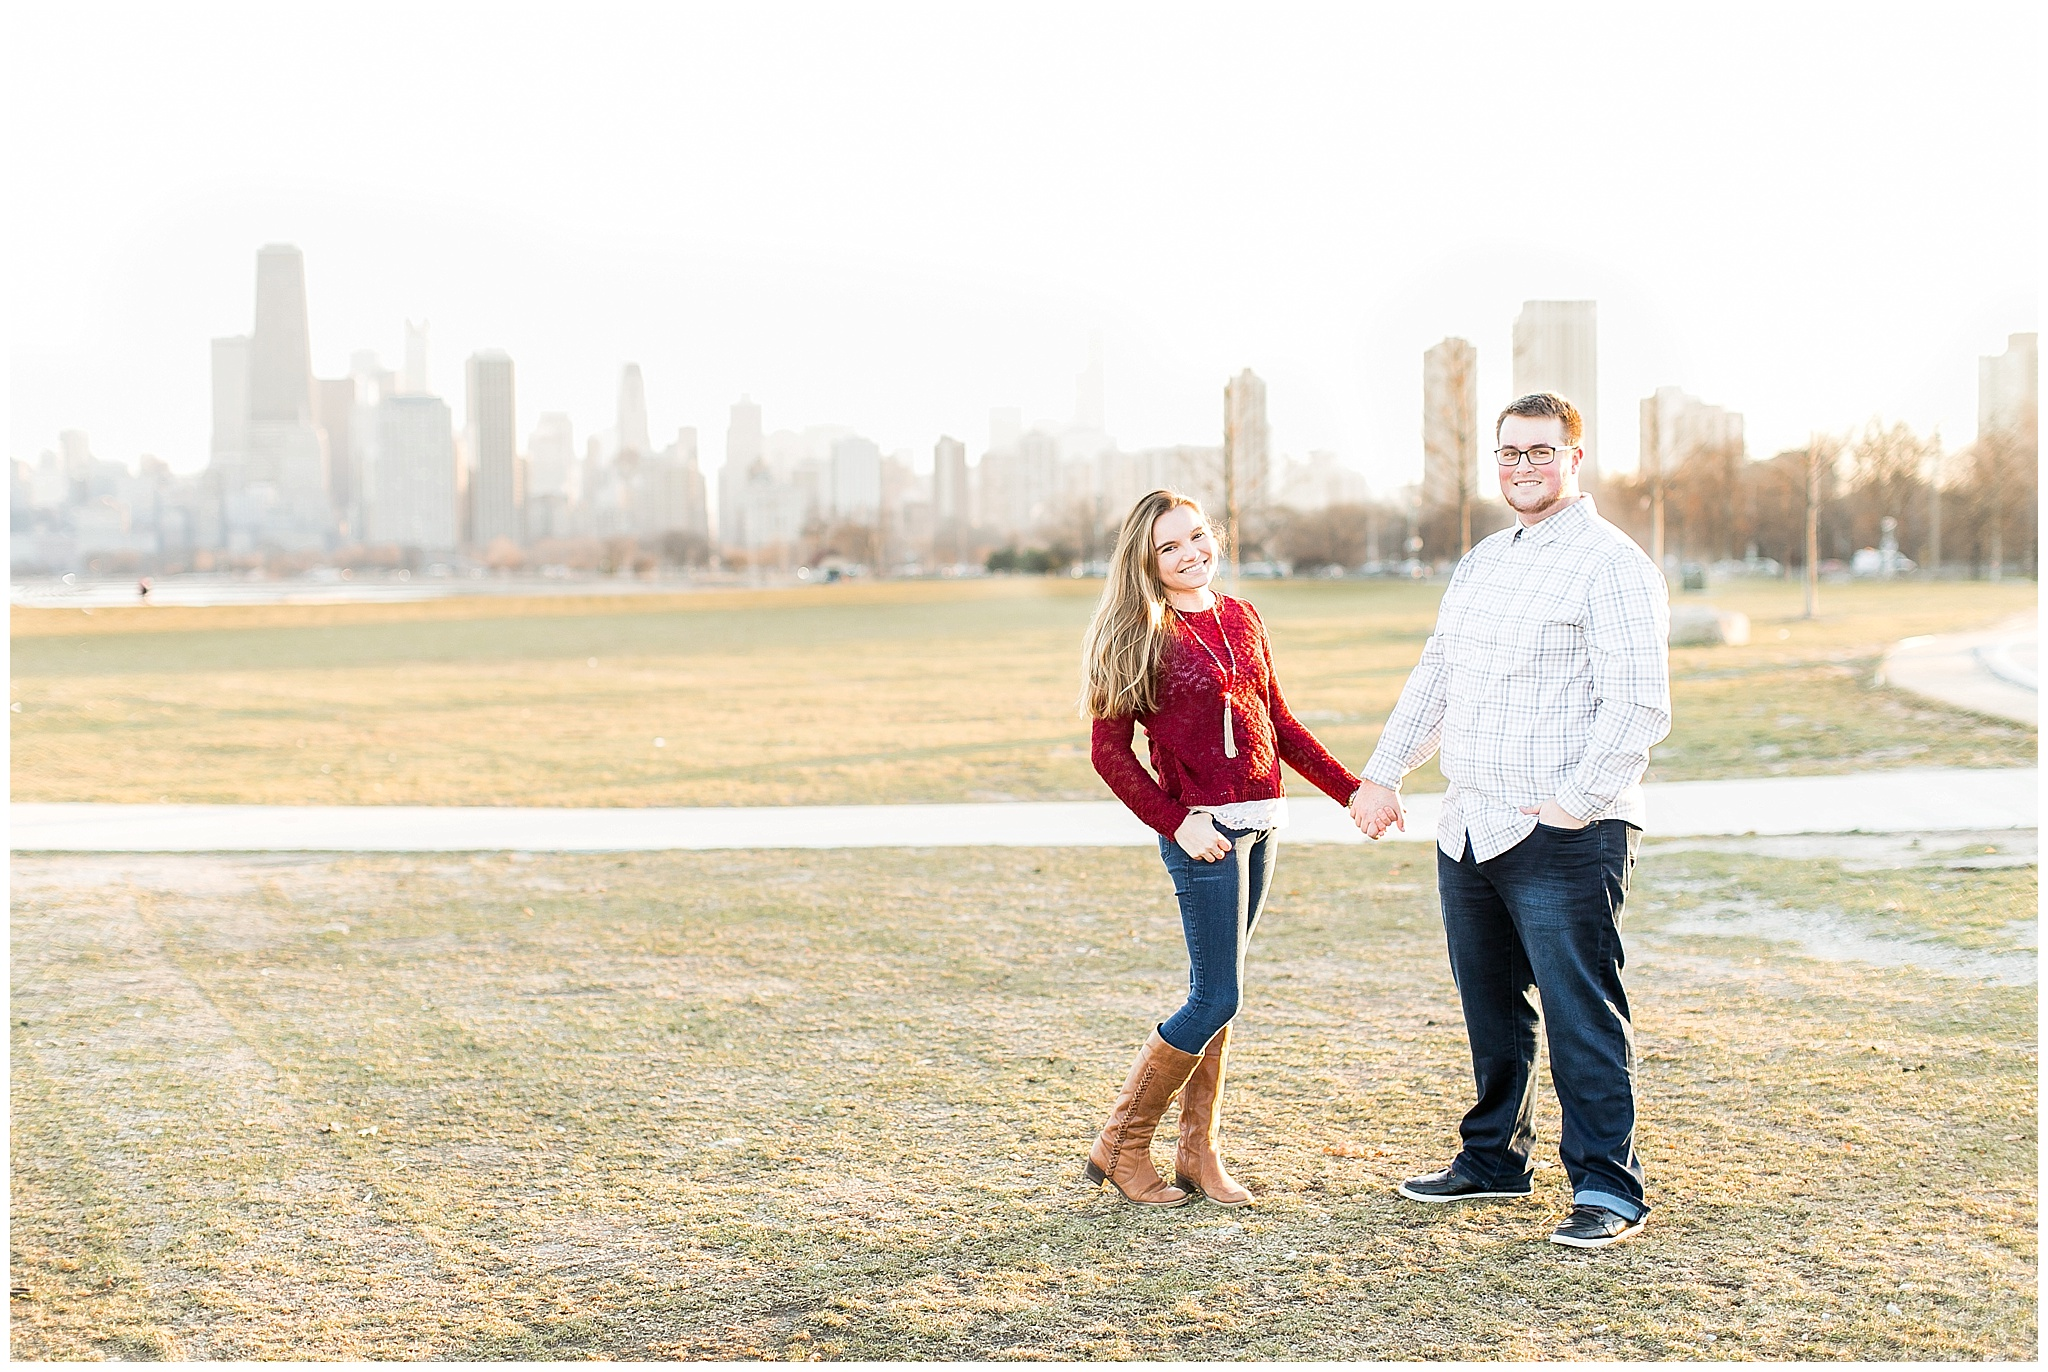 Chicago_Engagement_and_wedding_photographer_chicago_skyline_0986.jpg